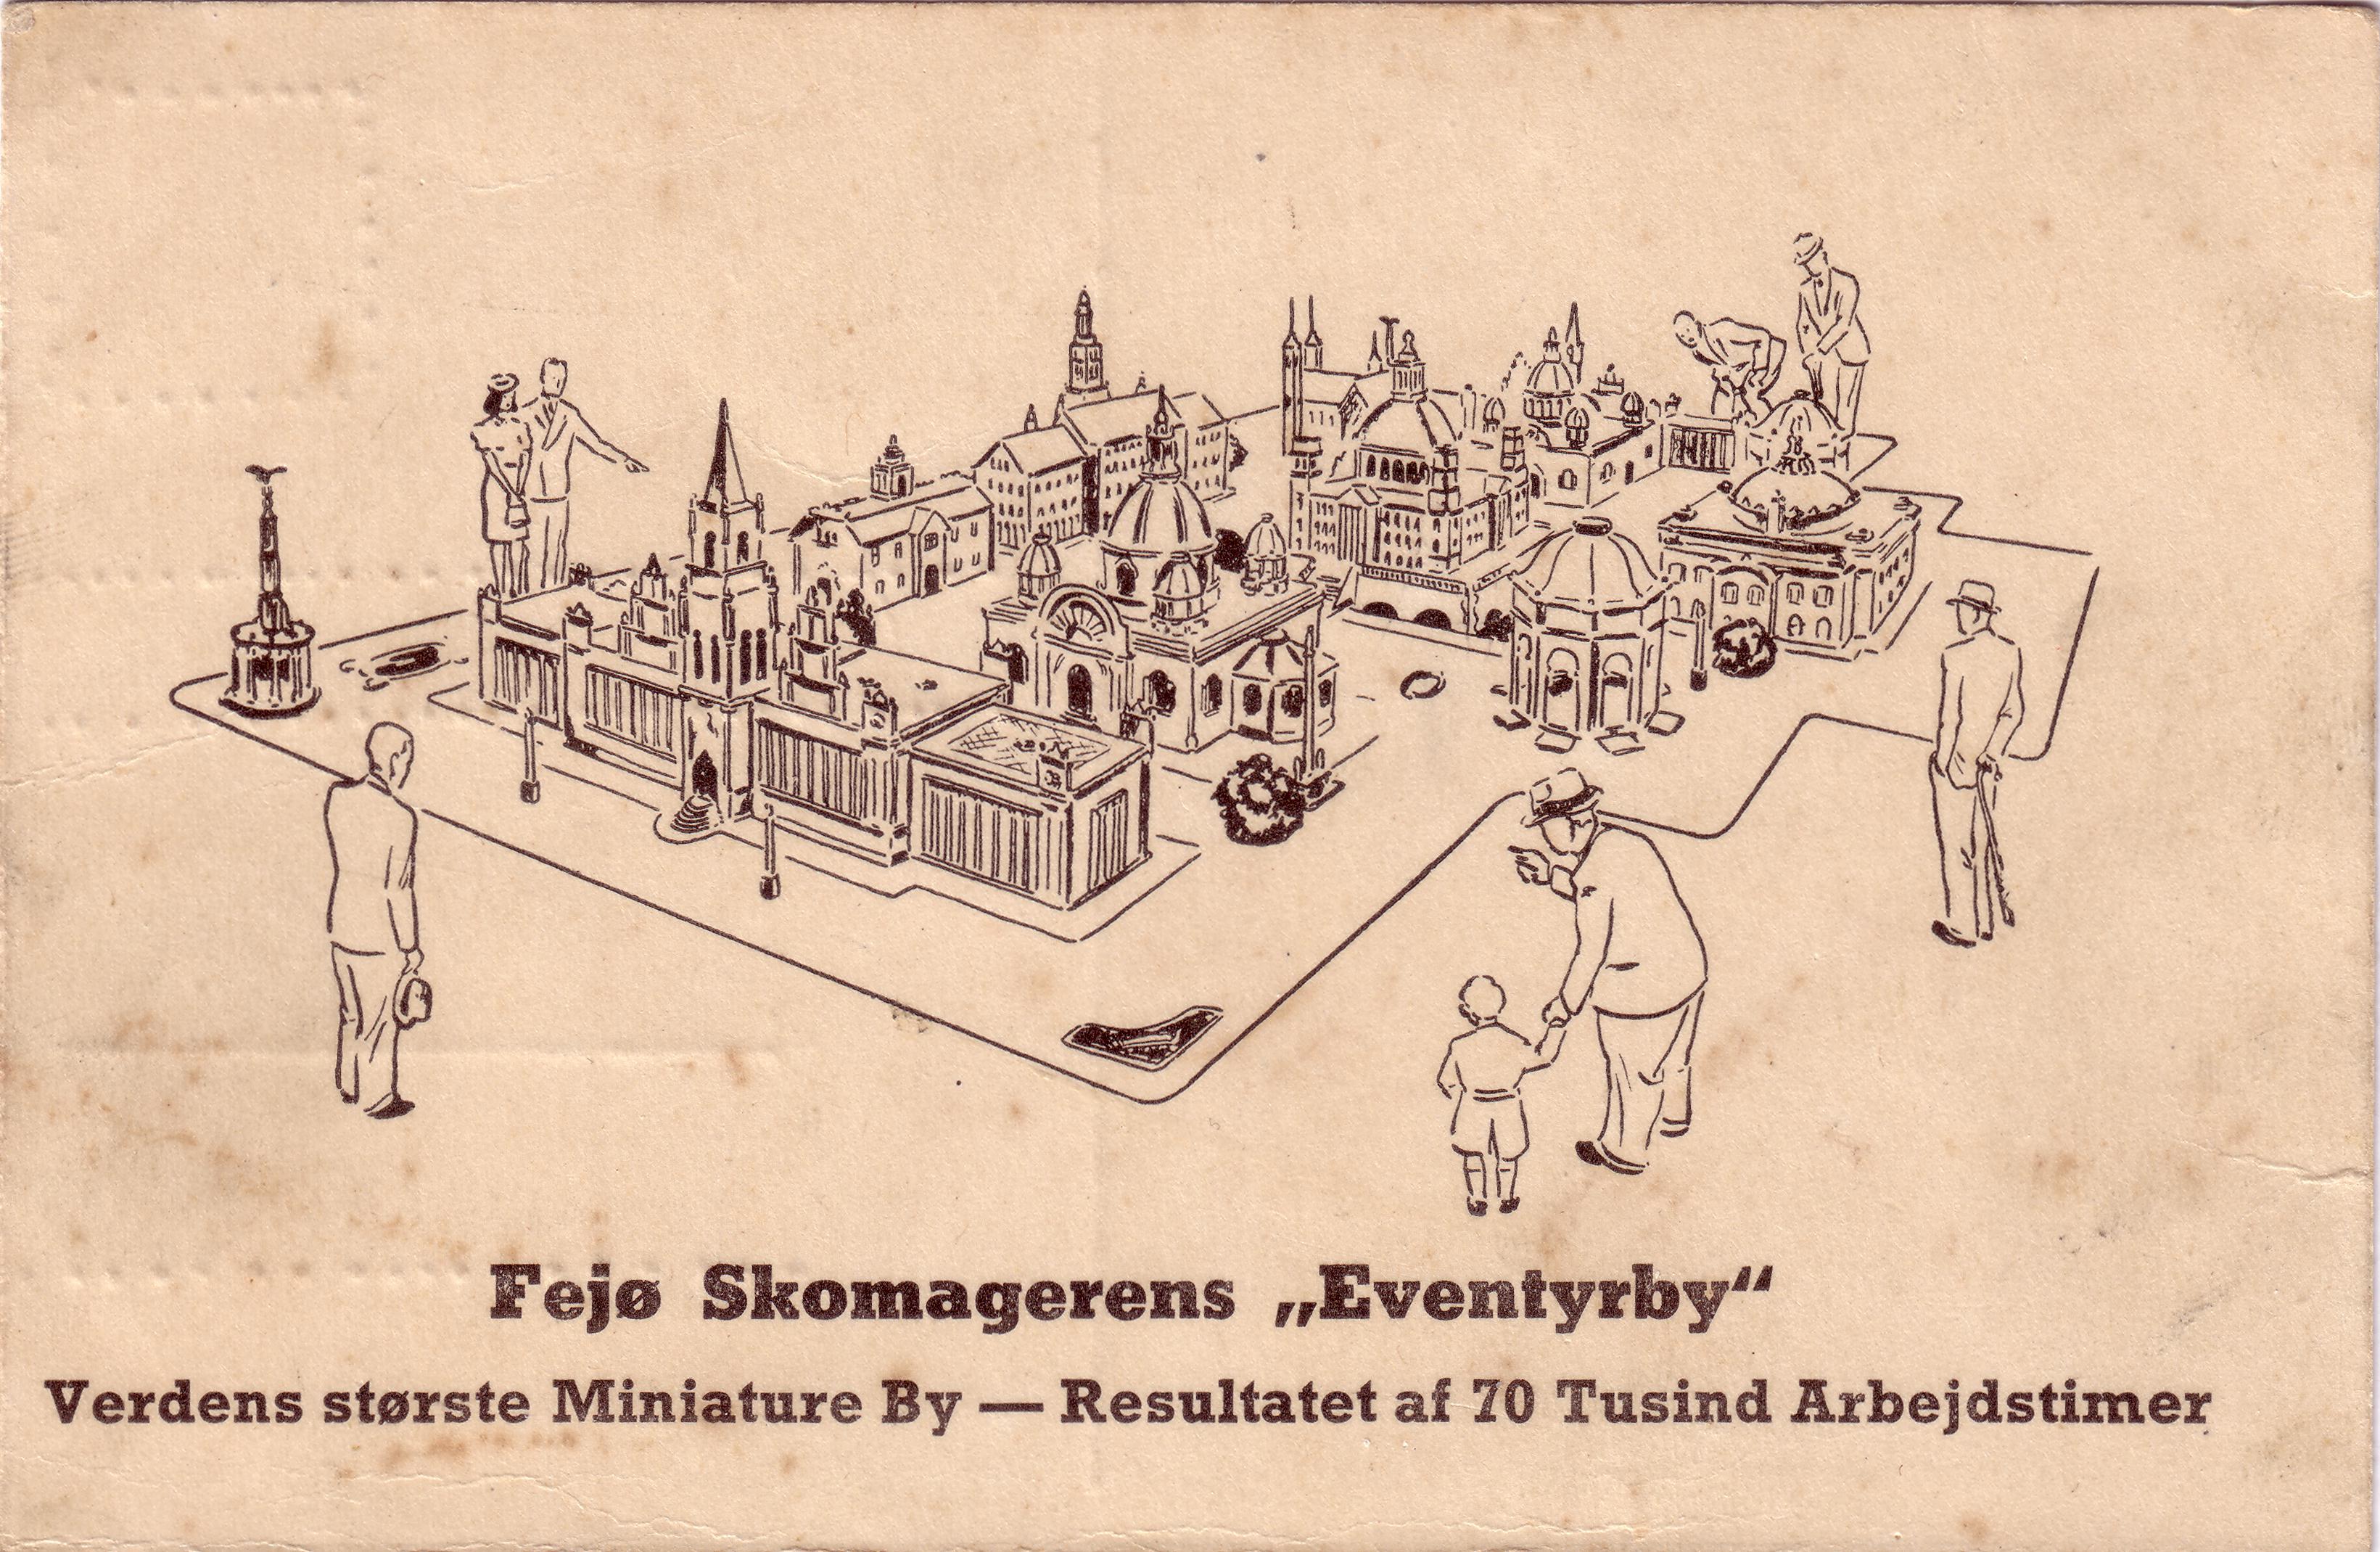 Fejøskomagerens eventyrby - ca. 1940